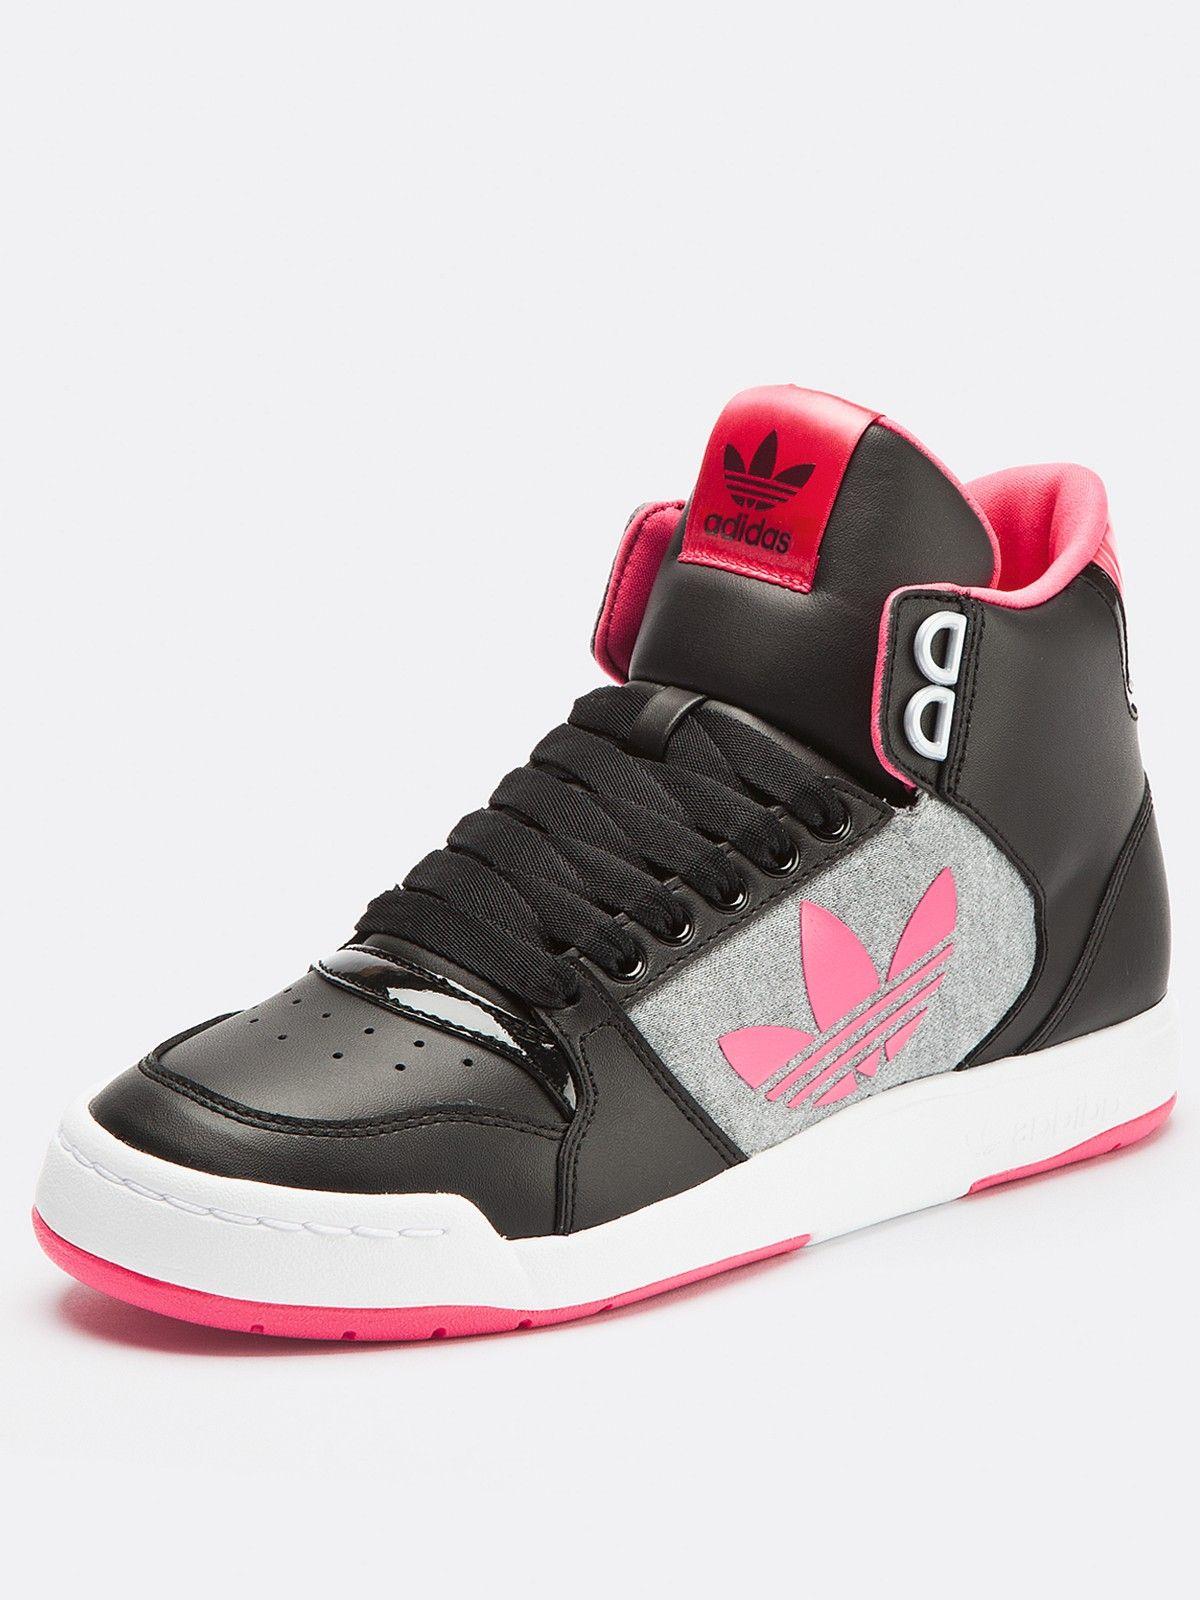 adidas OriginalsMidiru Court 2.0 Trefoil Trainers | Very.co.uk